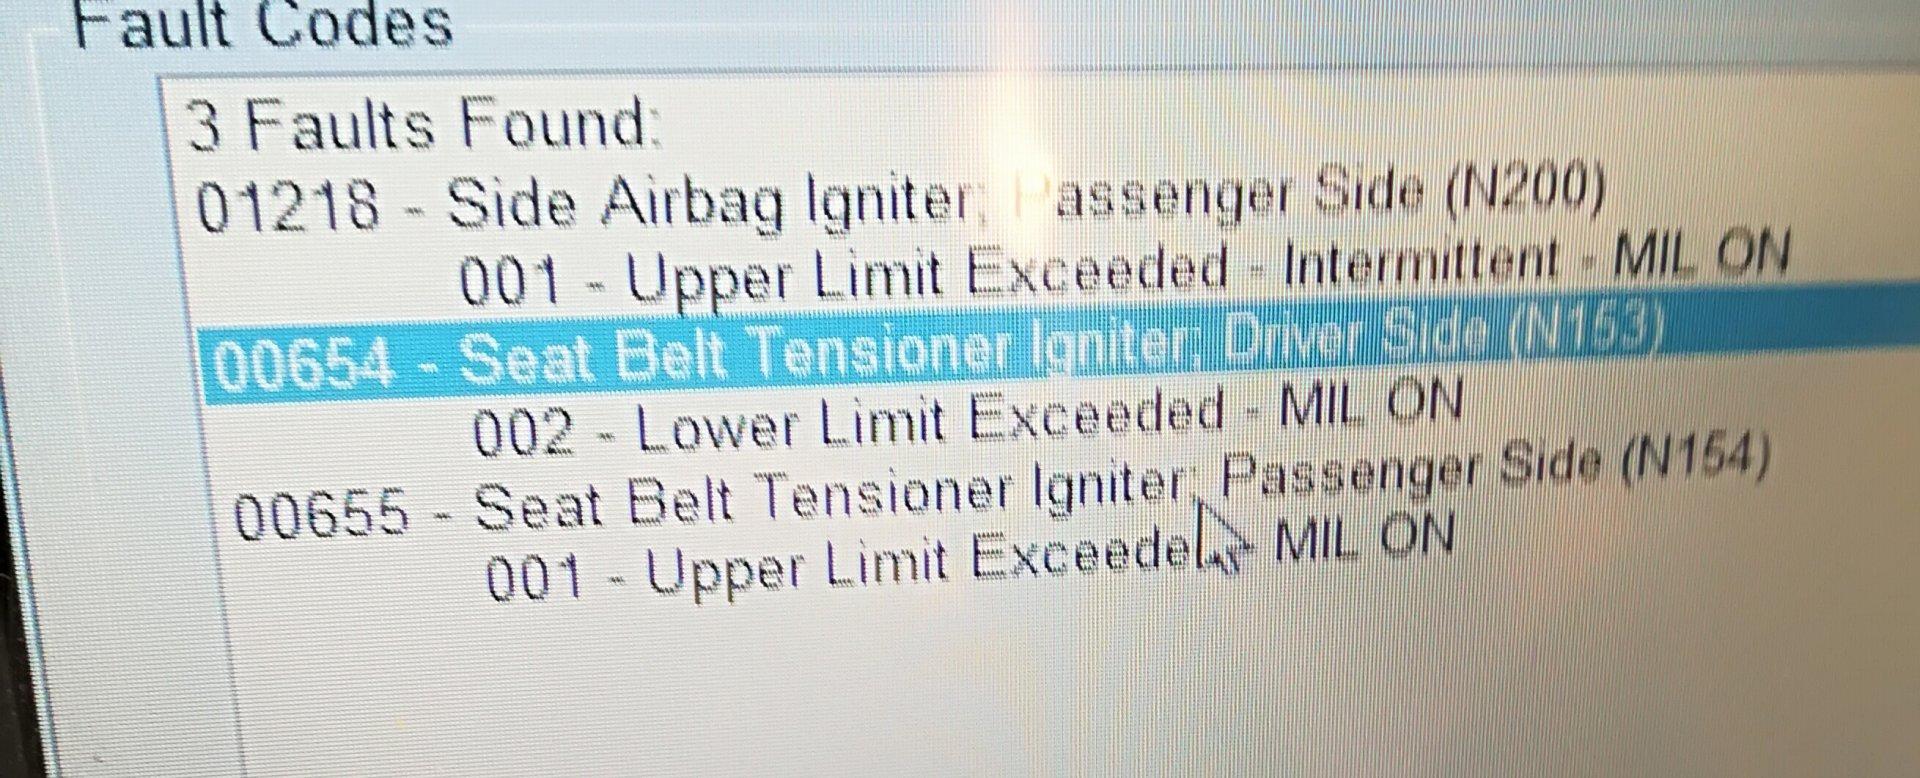 00655 Seat Belt Tensioner Igniter Elcho Table